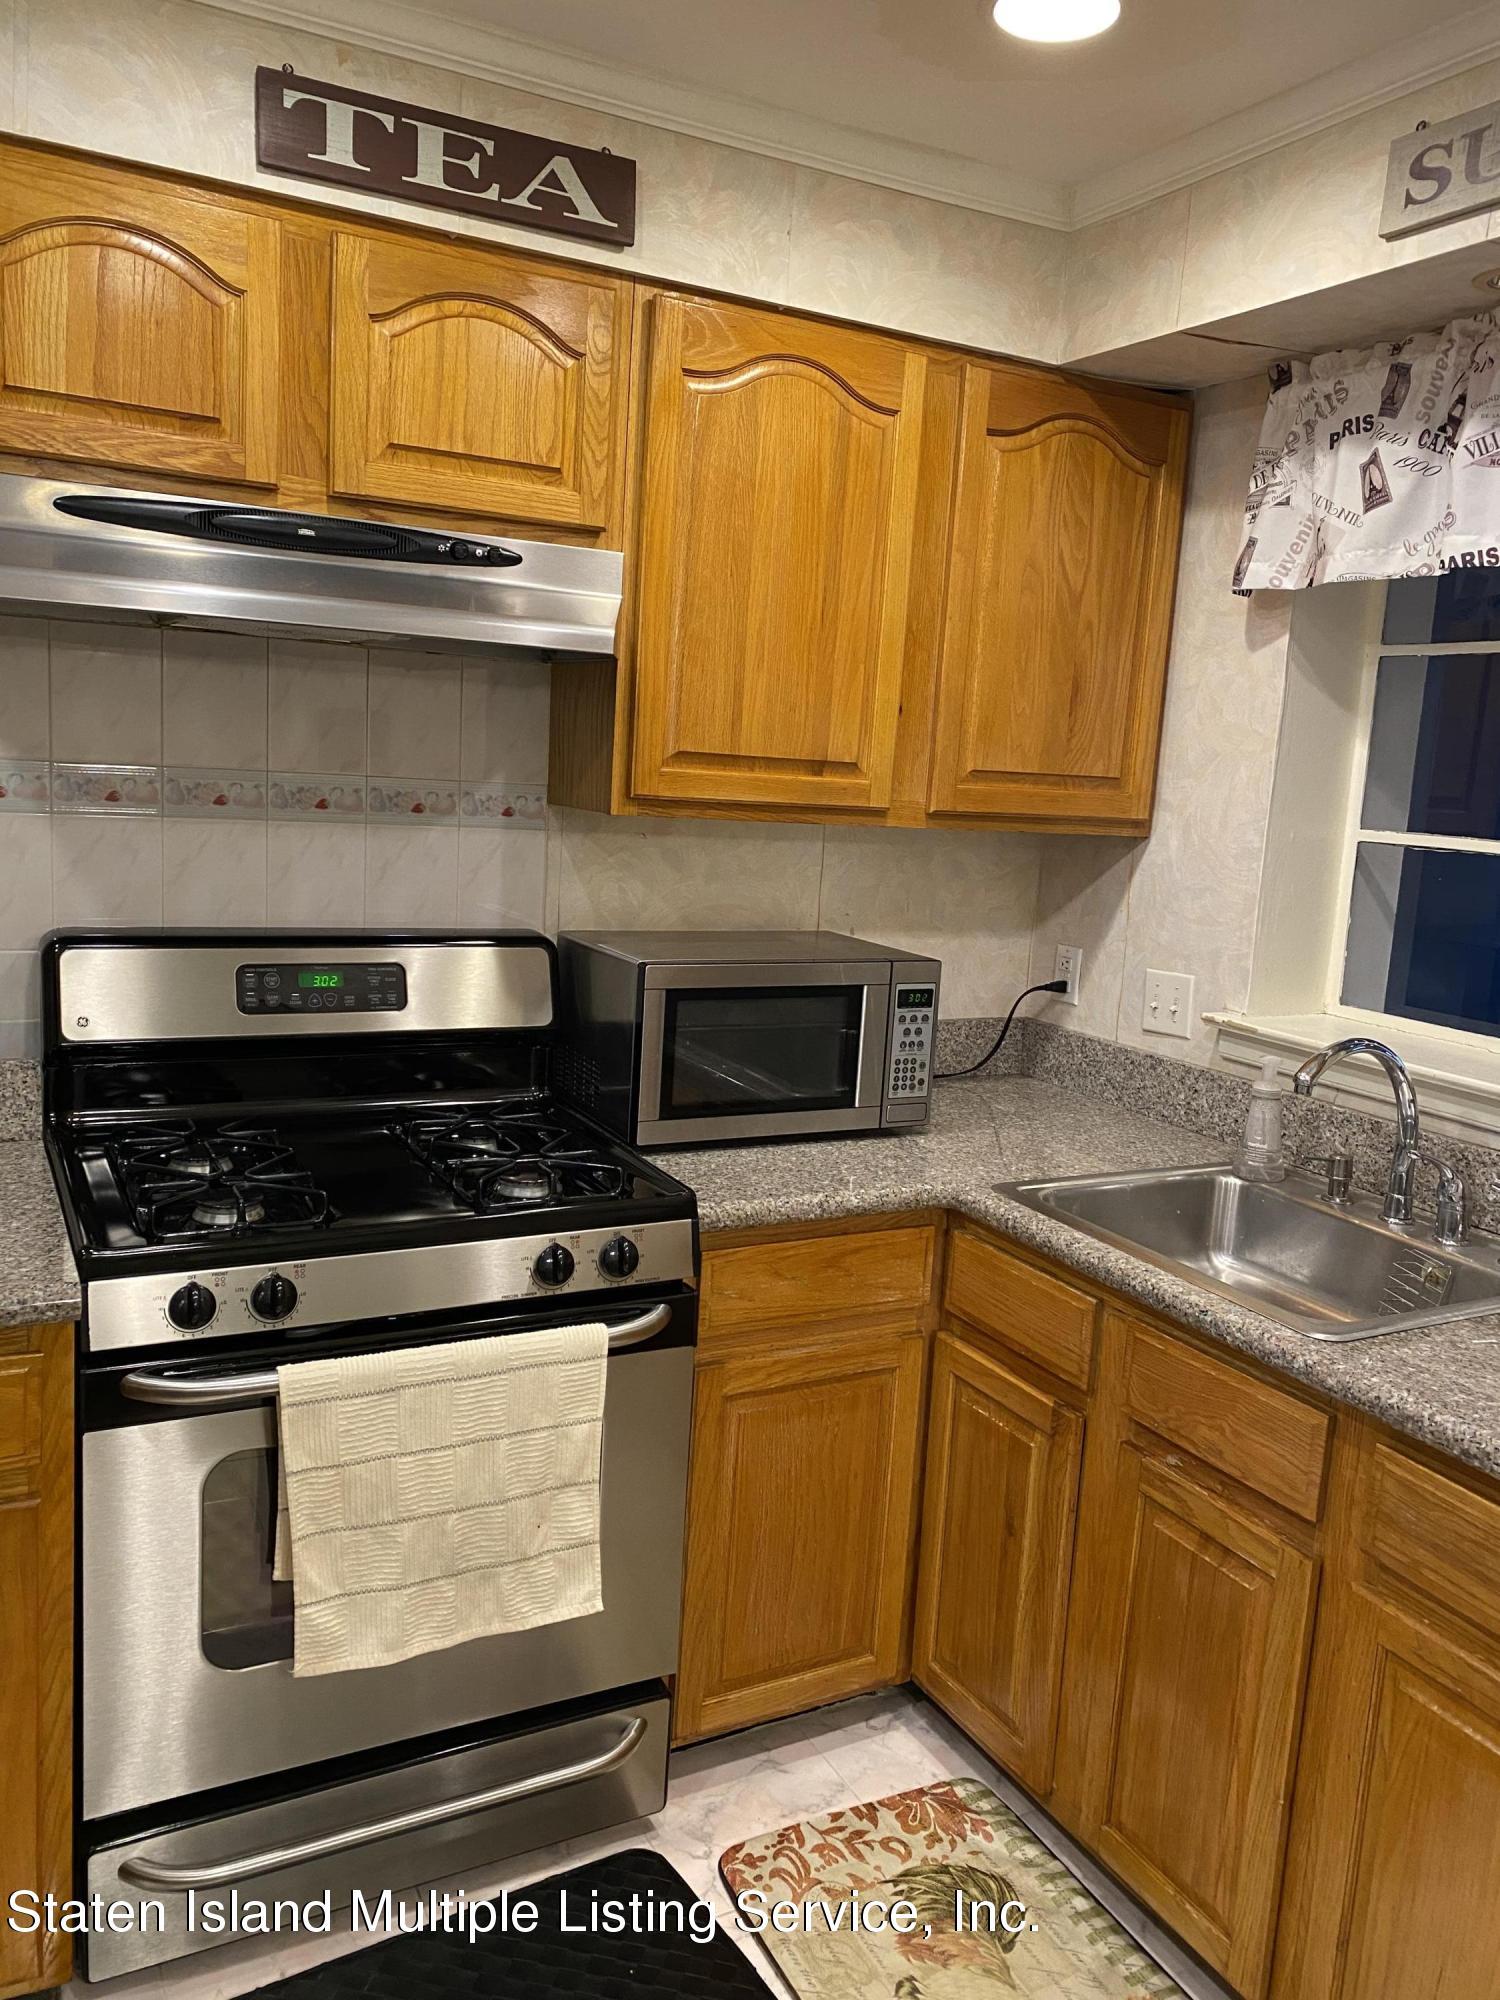 Single Family - Attached 2077 Shore Parkway  Brooklyn, NY 11214, MLS-1142185-4